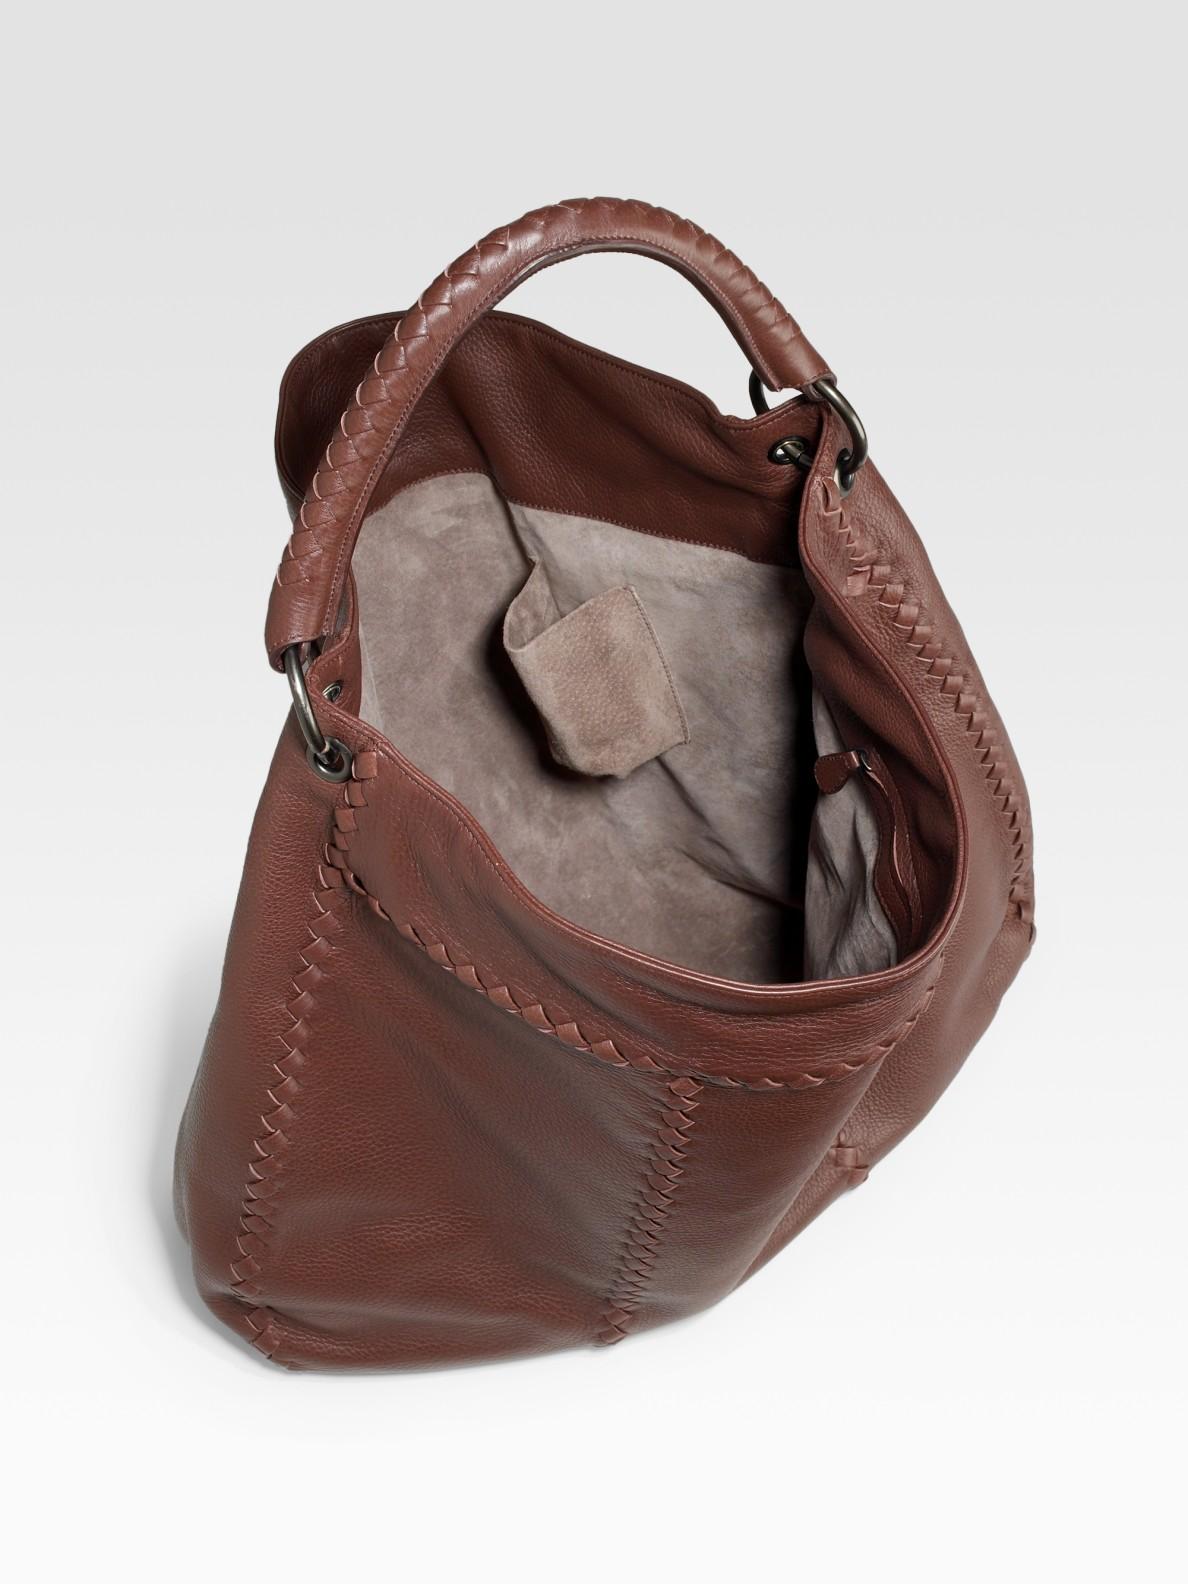 Bottega Veneta Cervo Hobo Bag